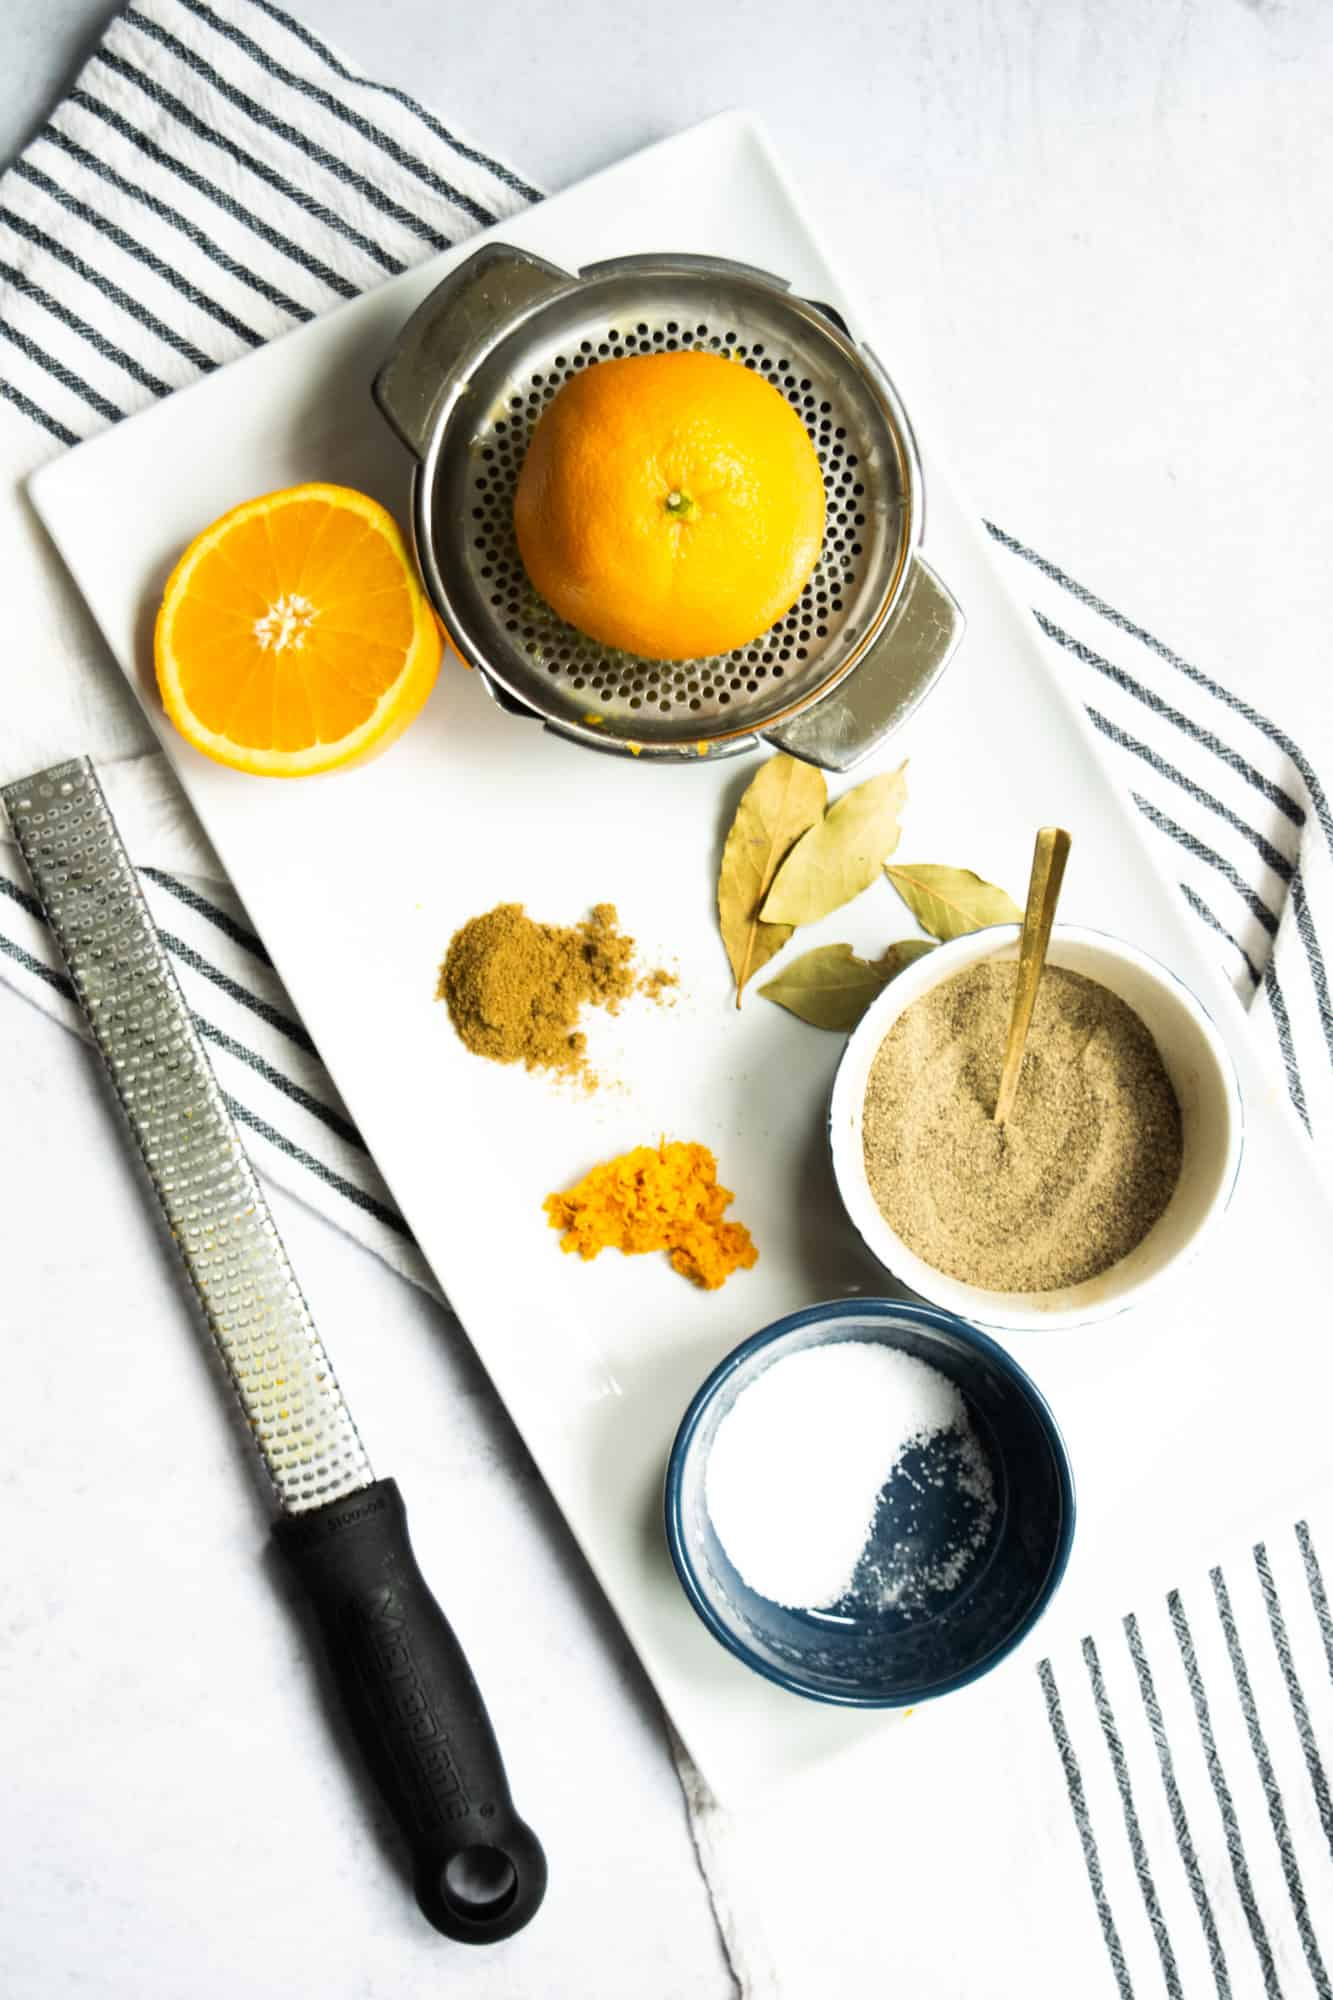 ingredients to make carnitas oranges, cumin, salt, pepper and bay leaves